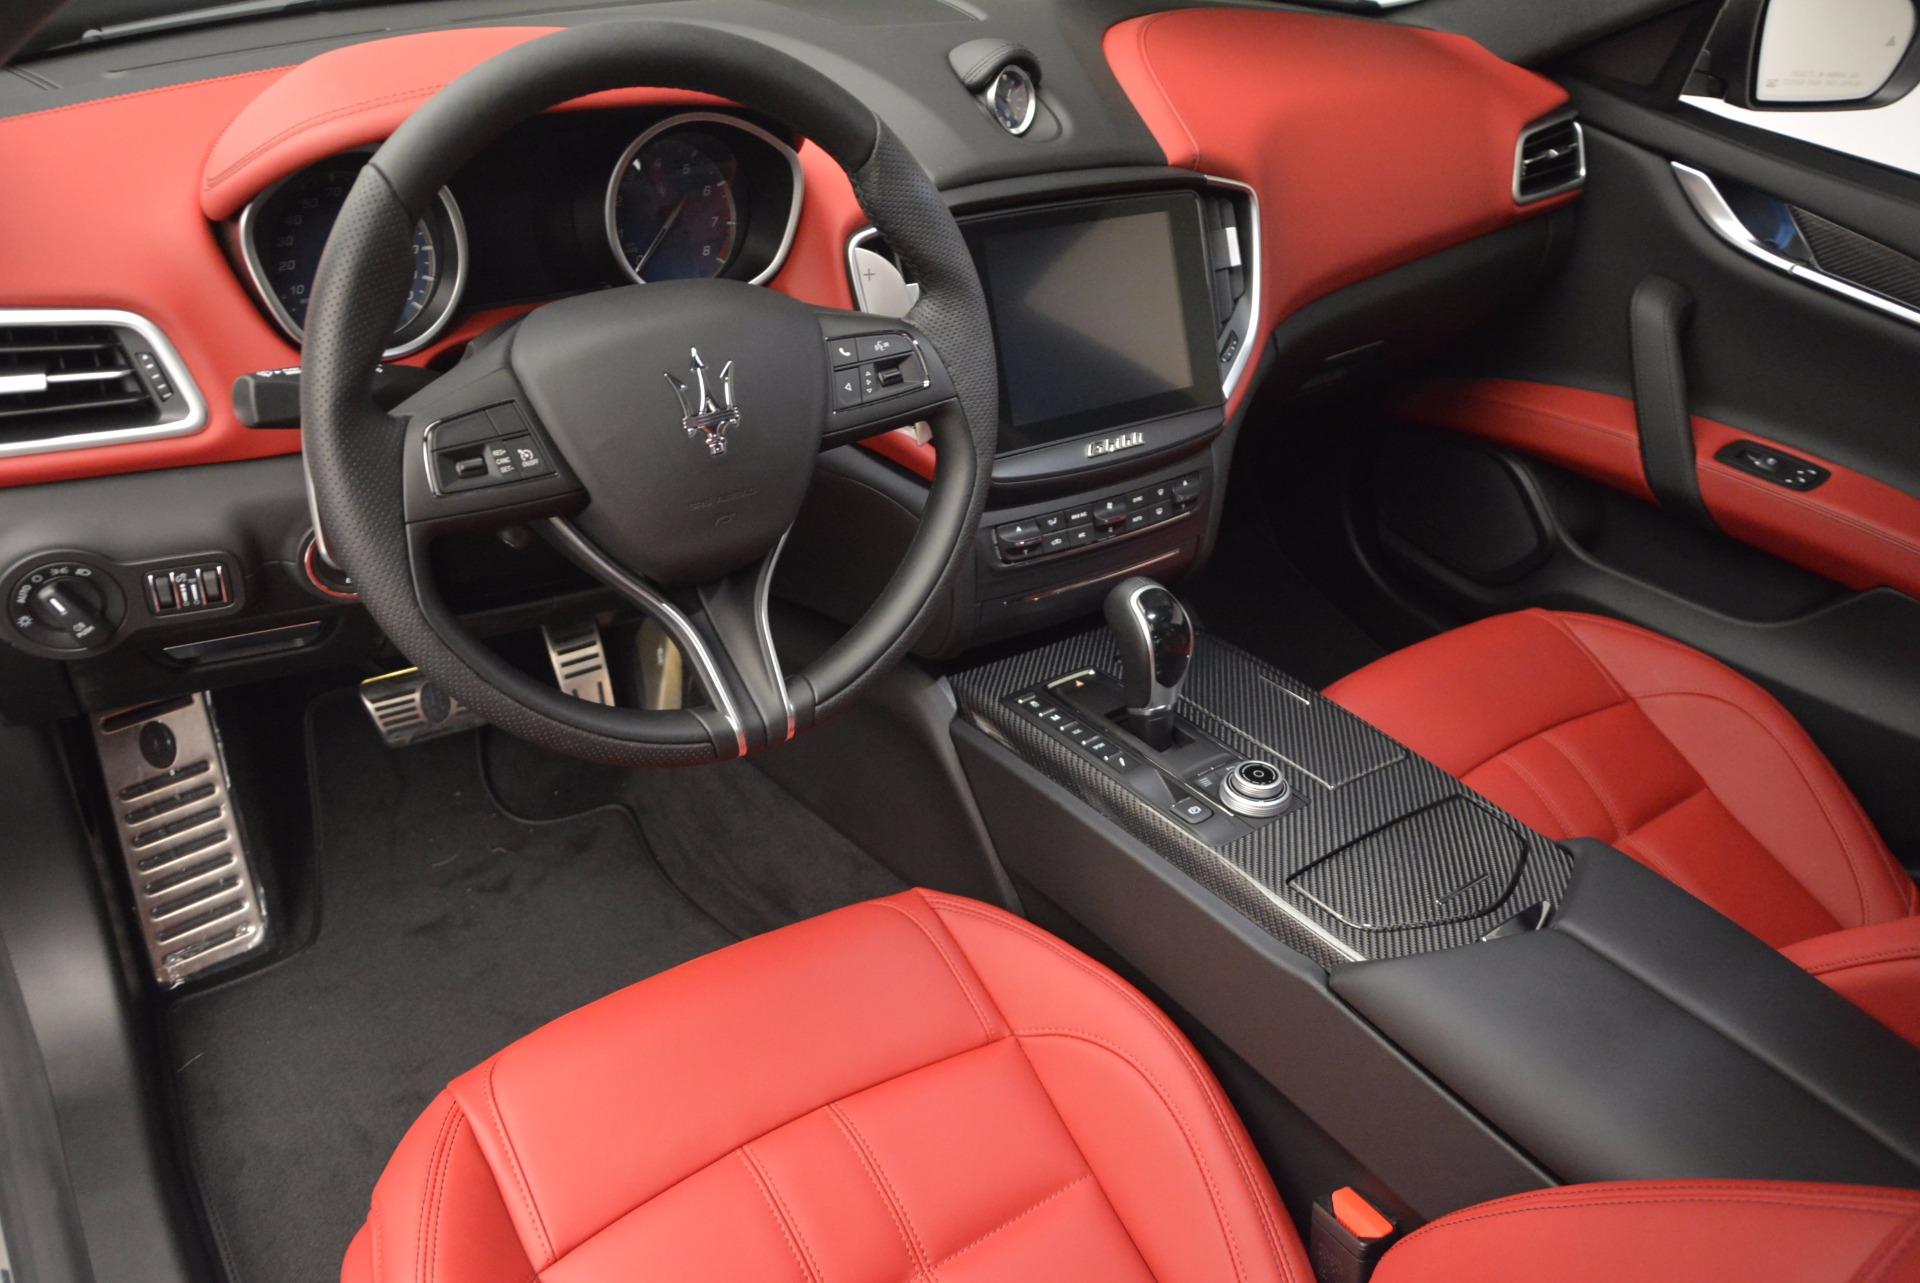 Used 2017 Maserati Ghibli S Q4 For Sale In Greenwich, CT 1121_p13